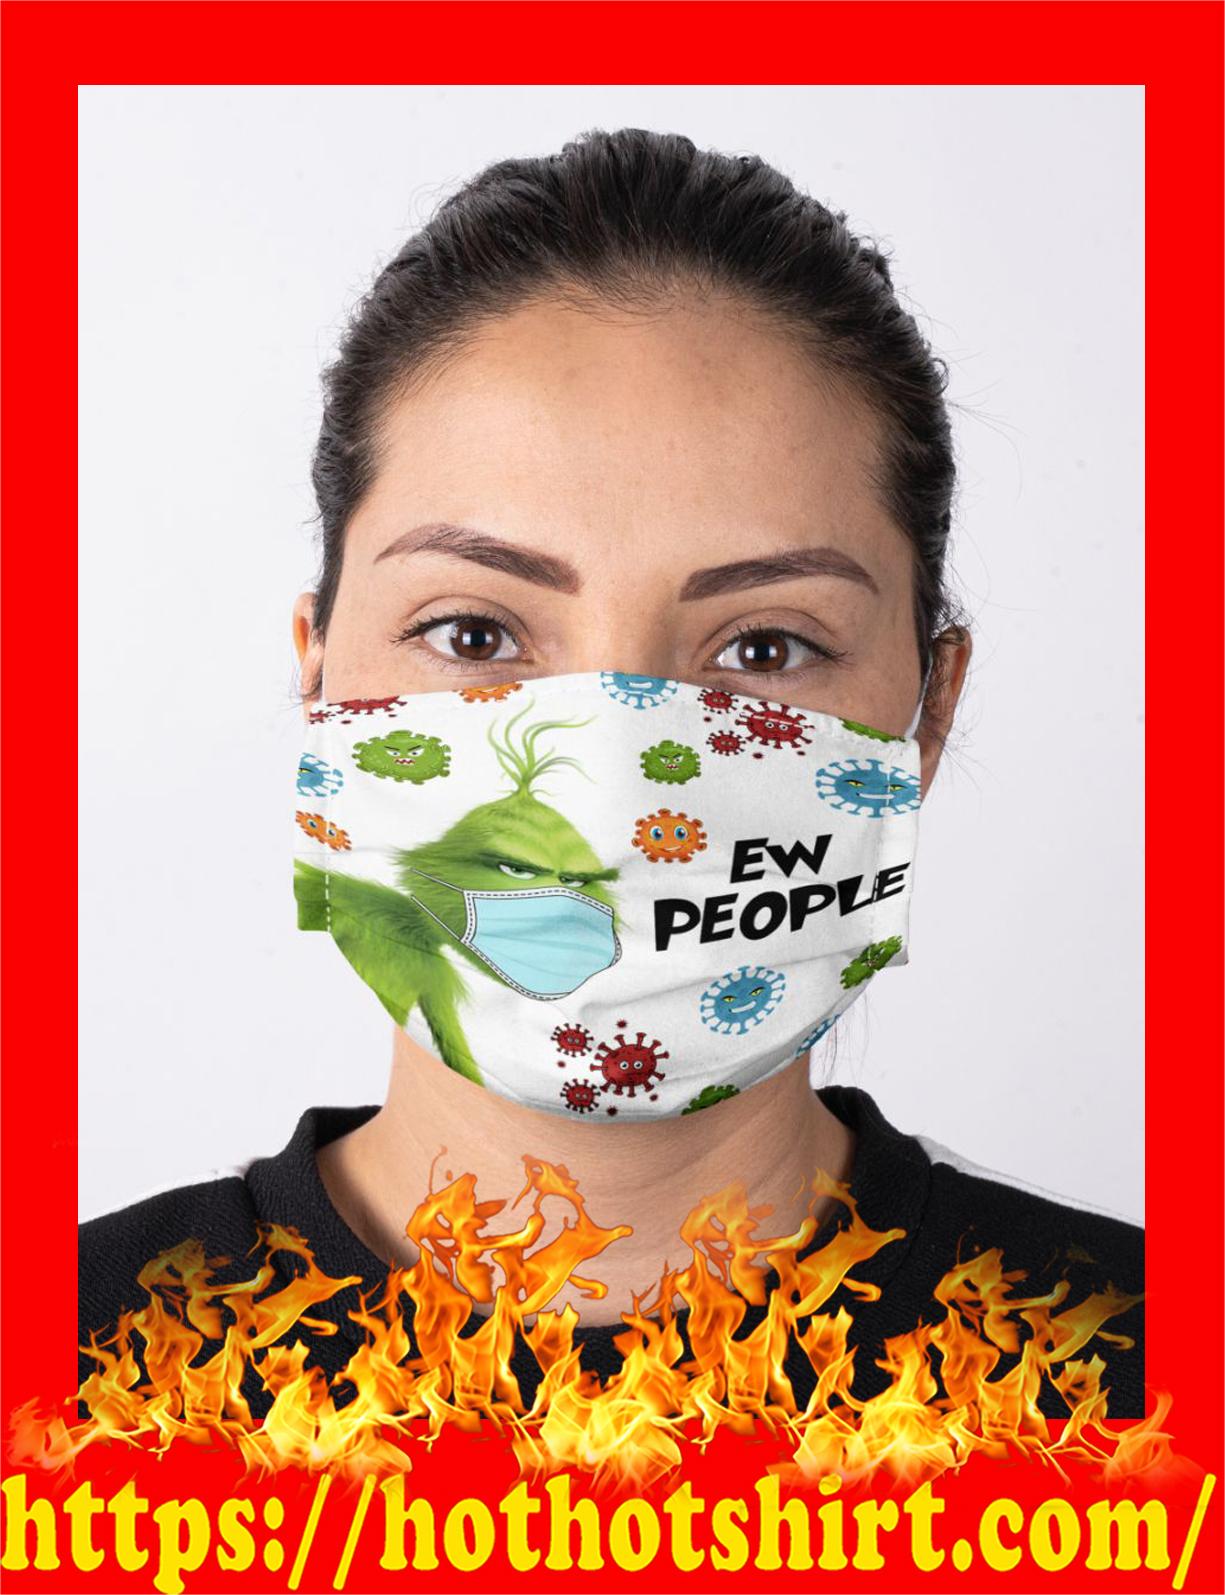 Cronavirus ew people grinch face mask - detail